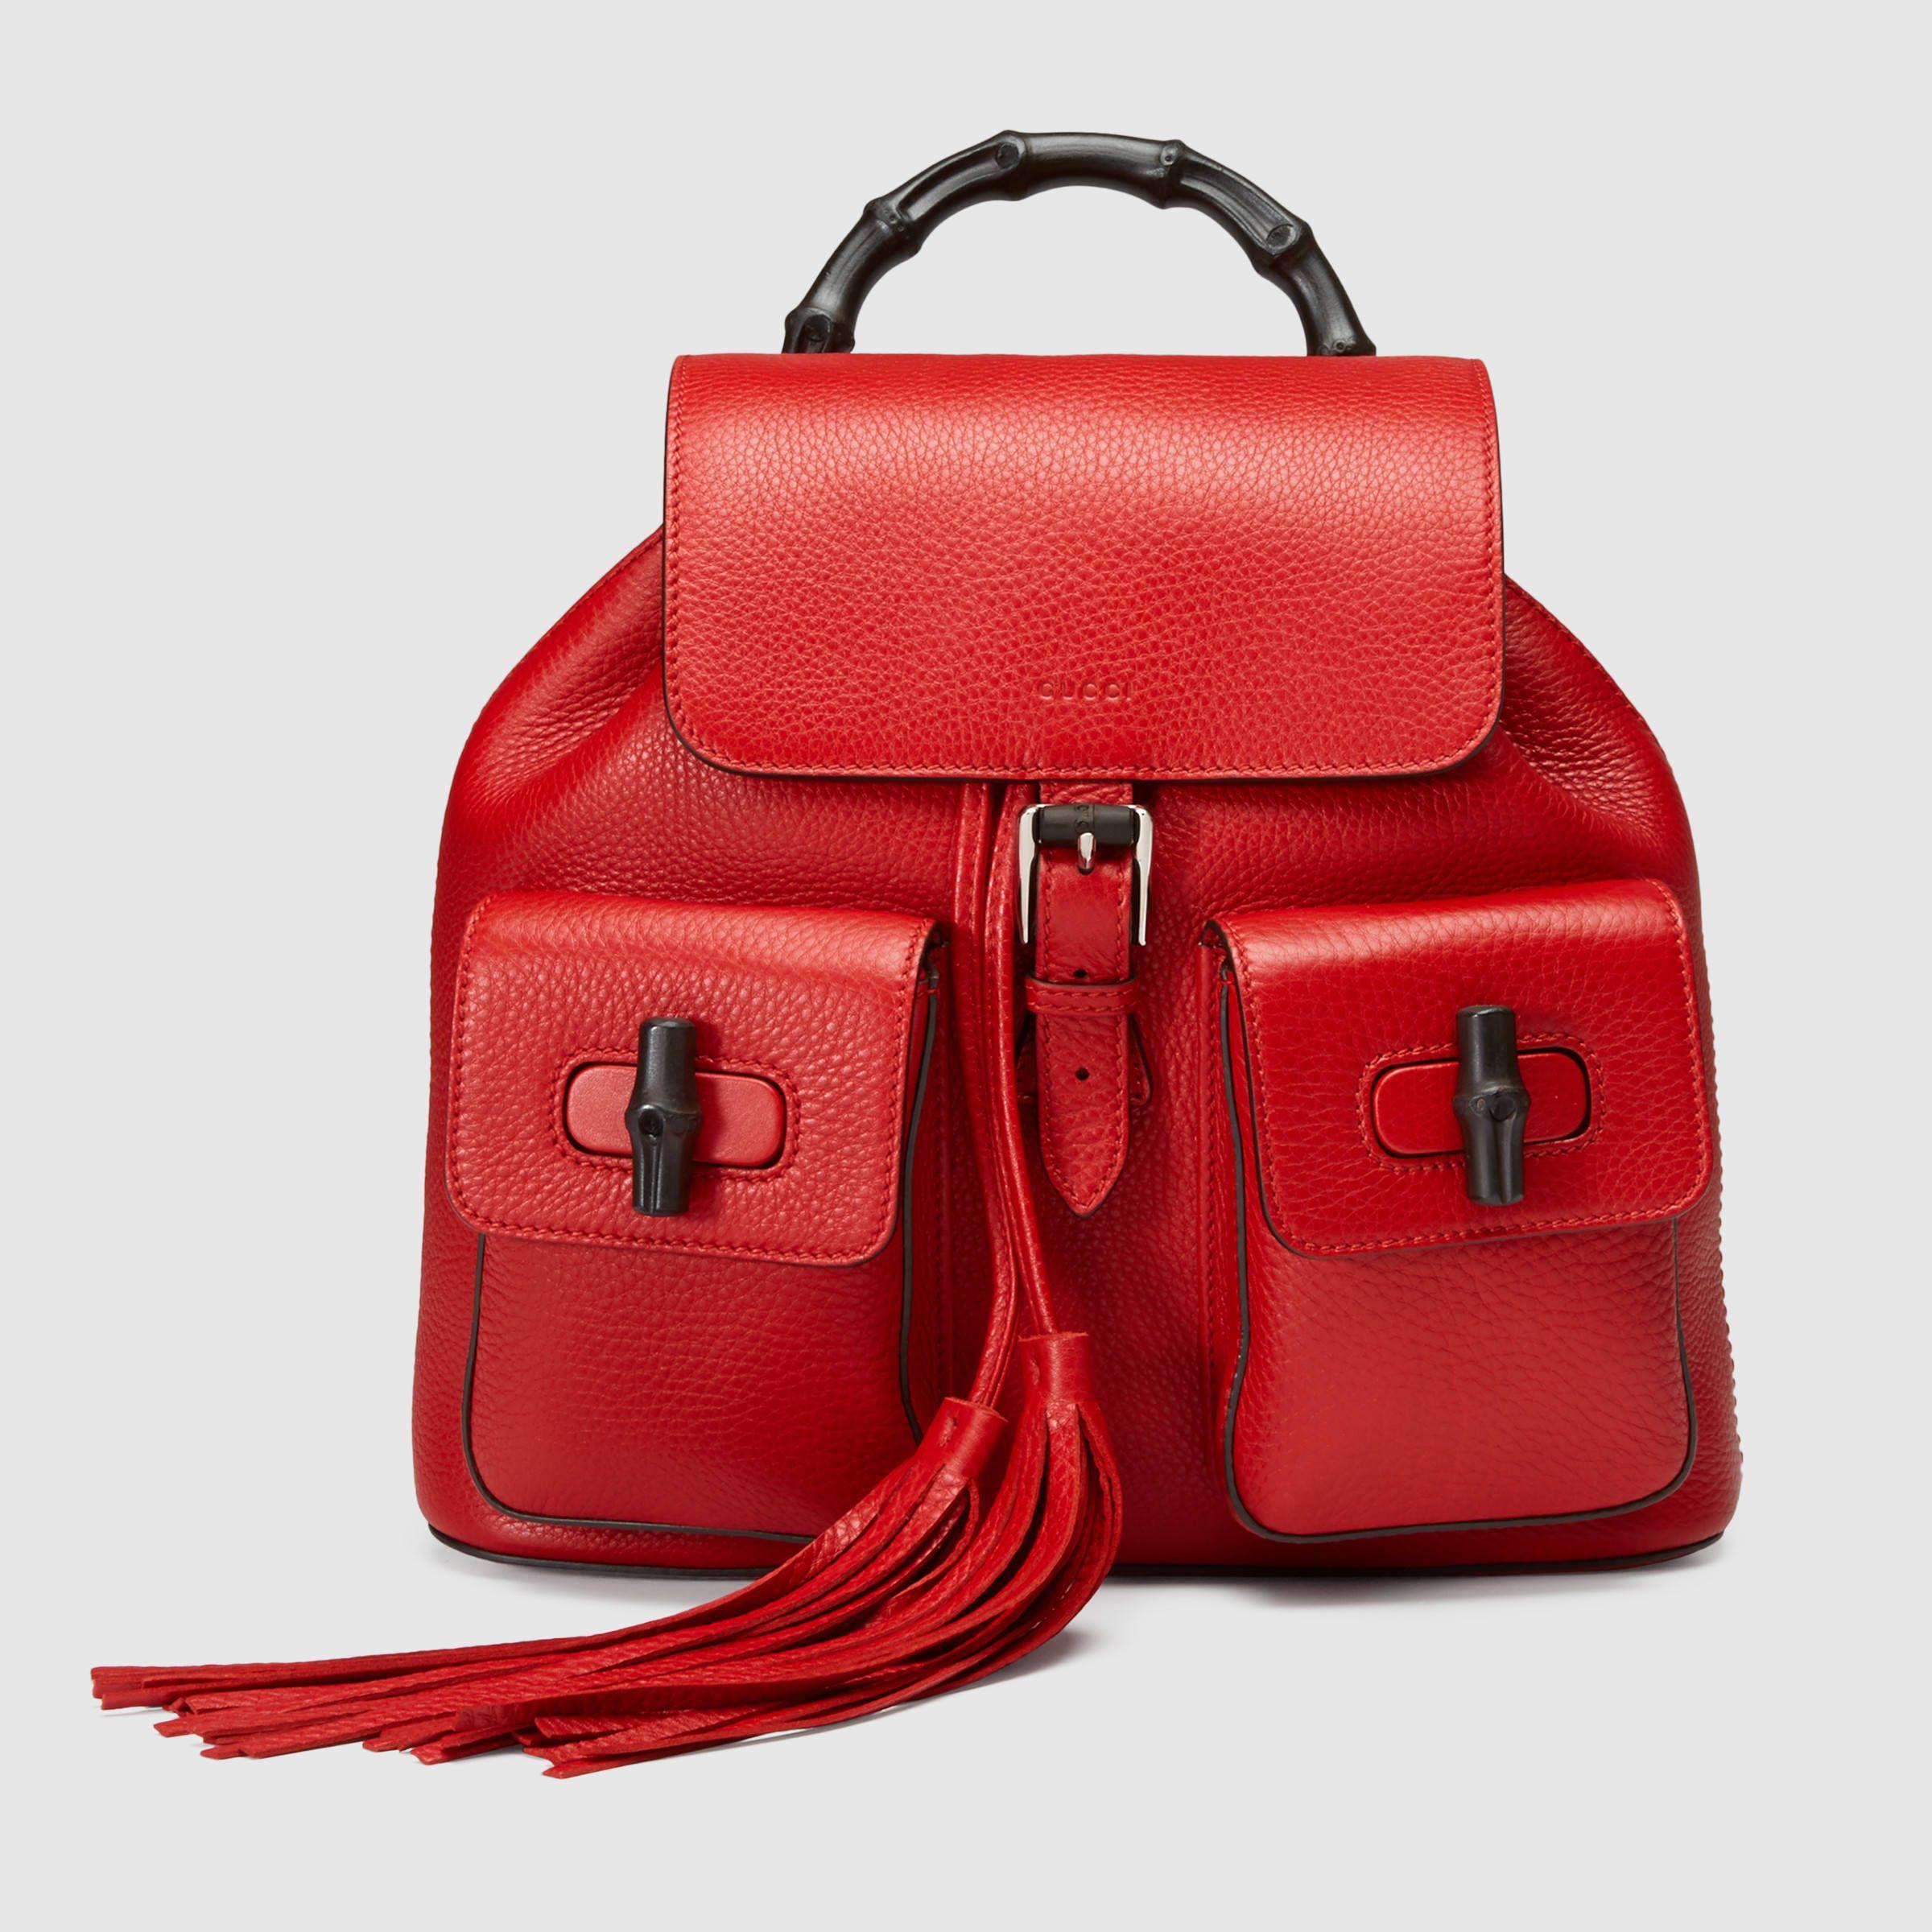 Gucci Women - Bamboo leather backpack - 370833A7M0N6433  f96e12886a54f